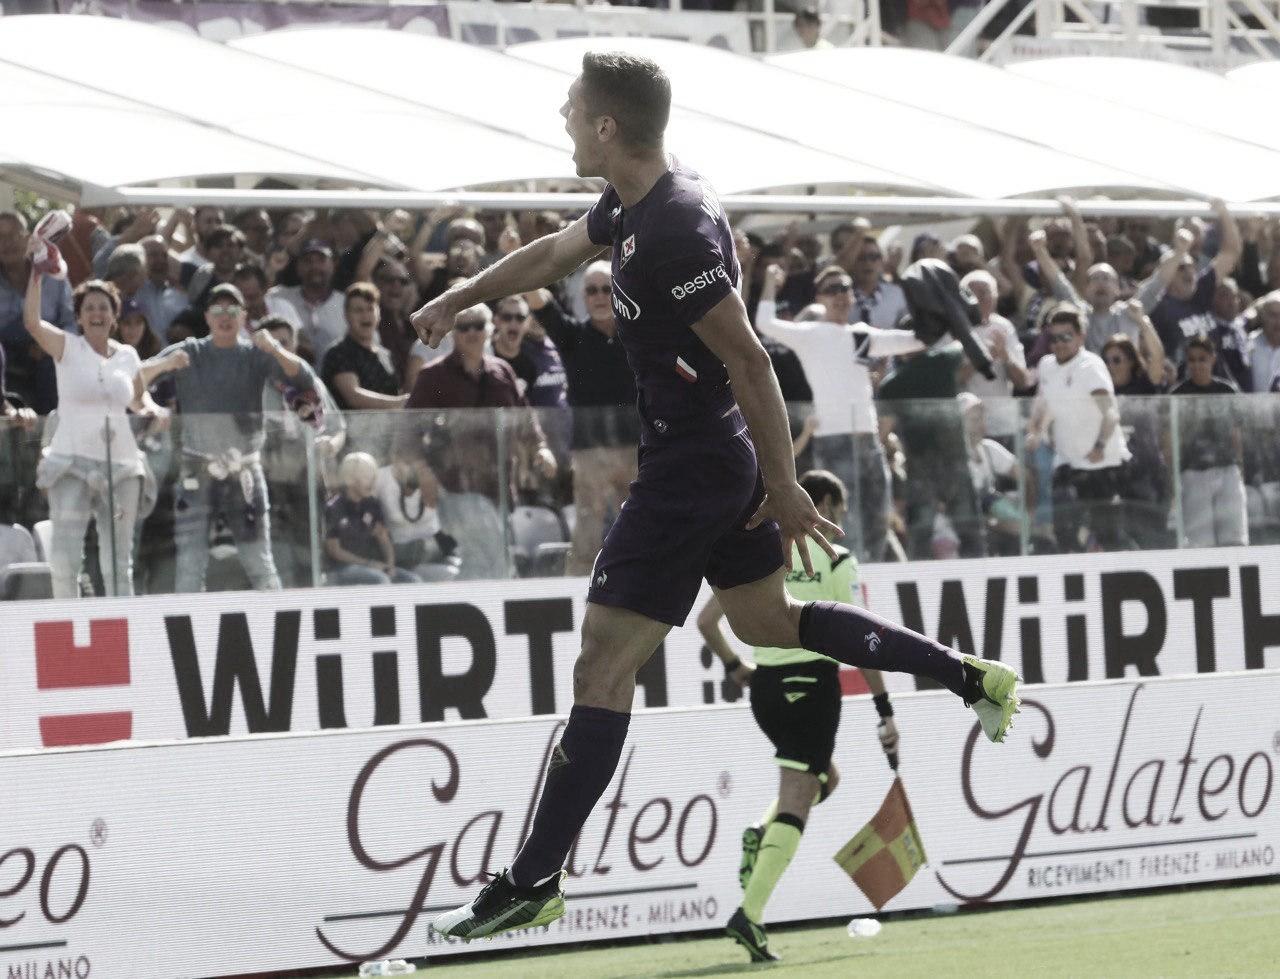 Fiorentina bate Udinese e chega à terceira vitória seguida na Serie A